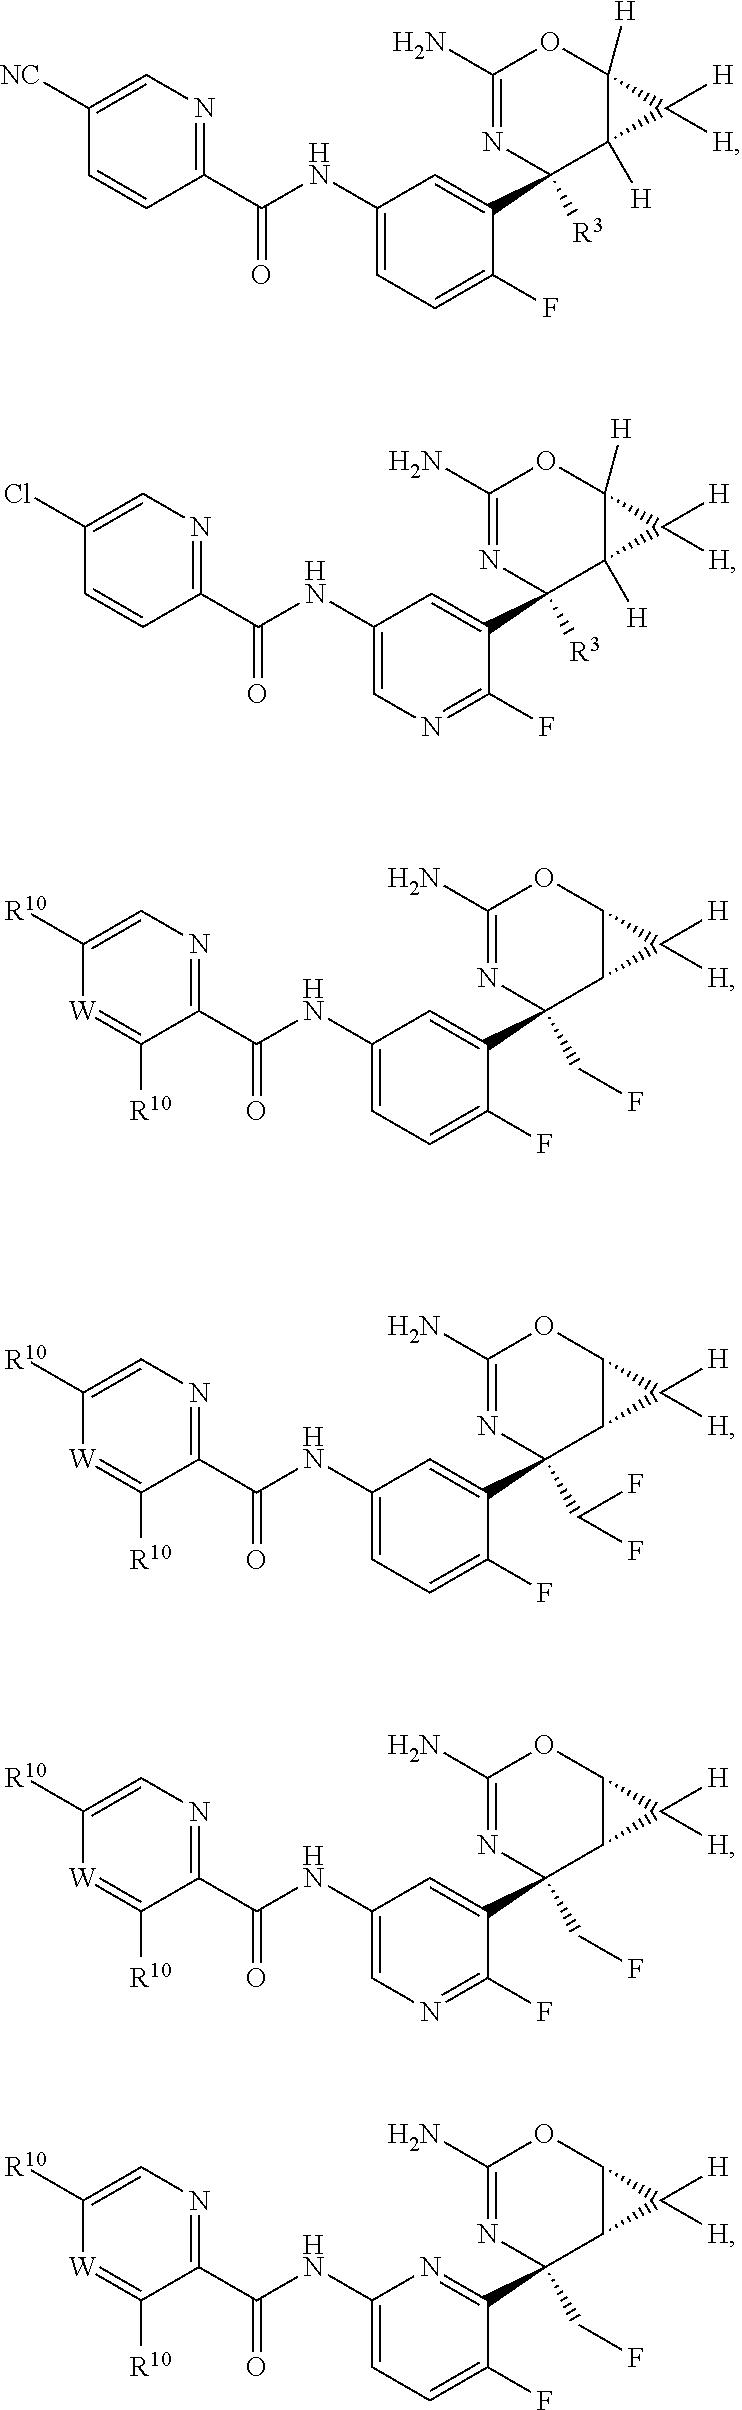 Us9611261b2 Perfluorinated Cyclopropyl Fused 13 Oxazin 2 Amine Hf Data Diagrams O Meta Dibromobenzene Figure Us09611261 20170404 C00044